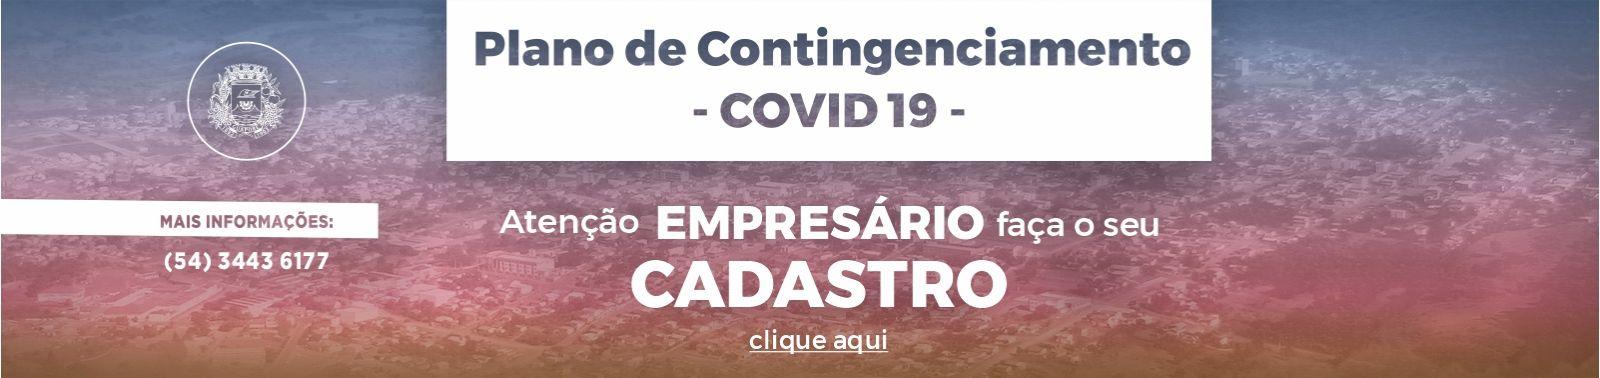 Banner 4 - Plano Contingenciamento - CADASTRAMENTO